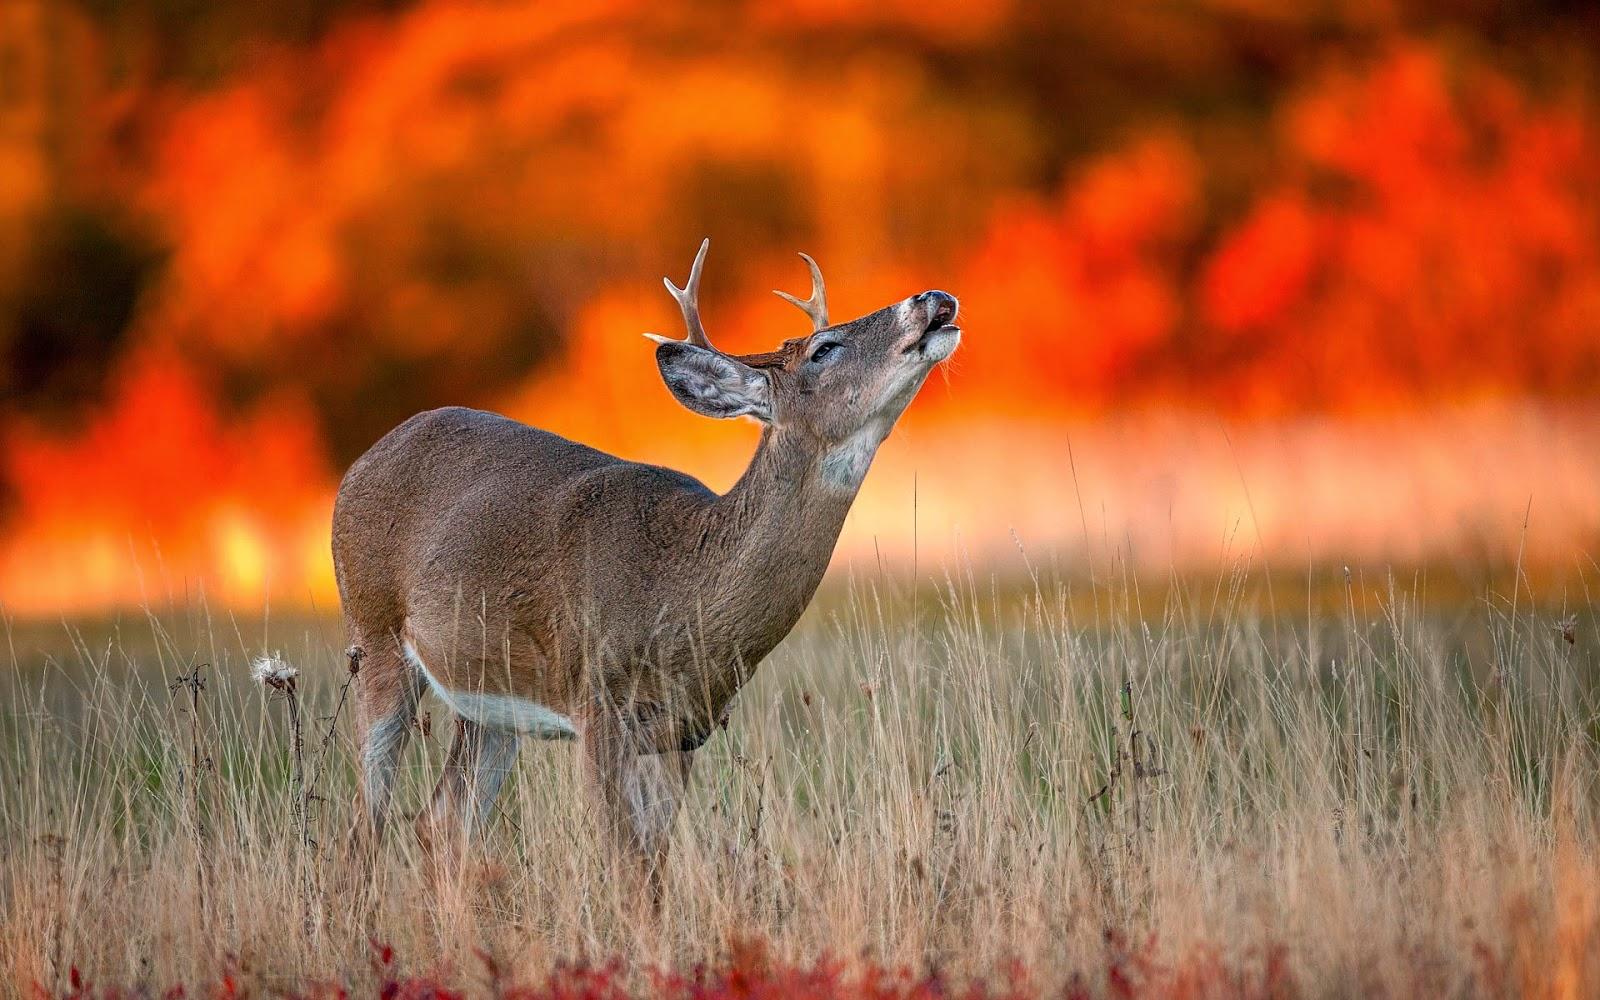 Fall Wallpaper With Deer Amazing Animal Desktop Backgrounds Hdwallpapers Animal